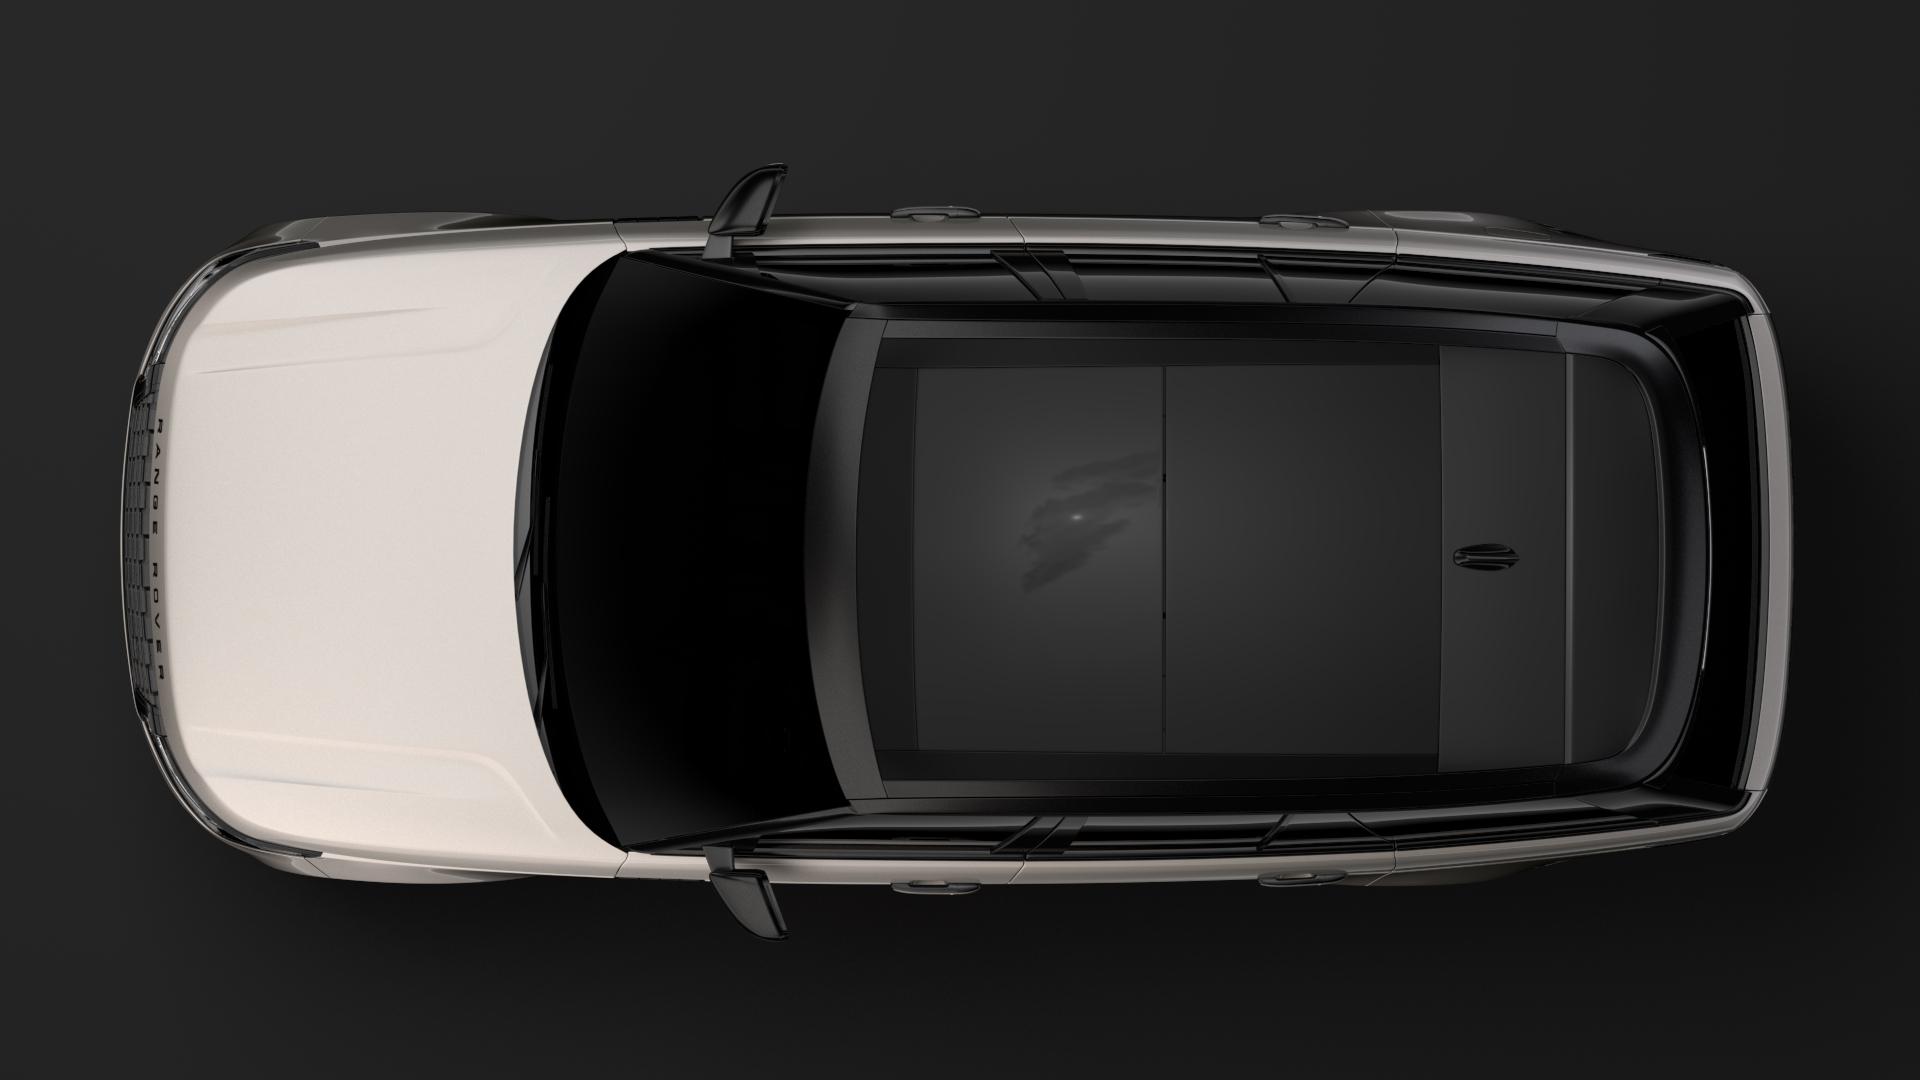 range rover autobiography hybrid (l405) 2018 3d model max fbx c4d lwo ma mb hrc xsi obj 278151